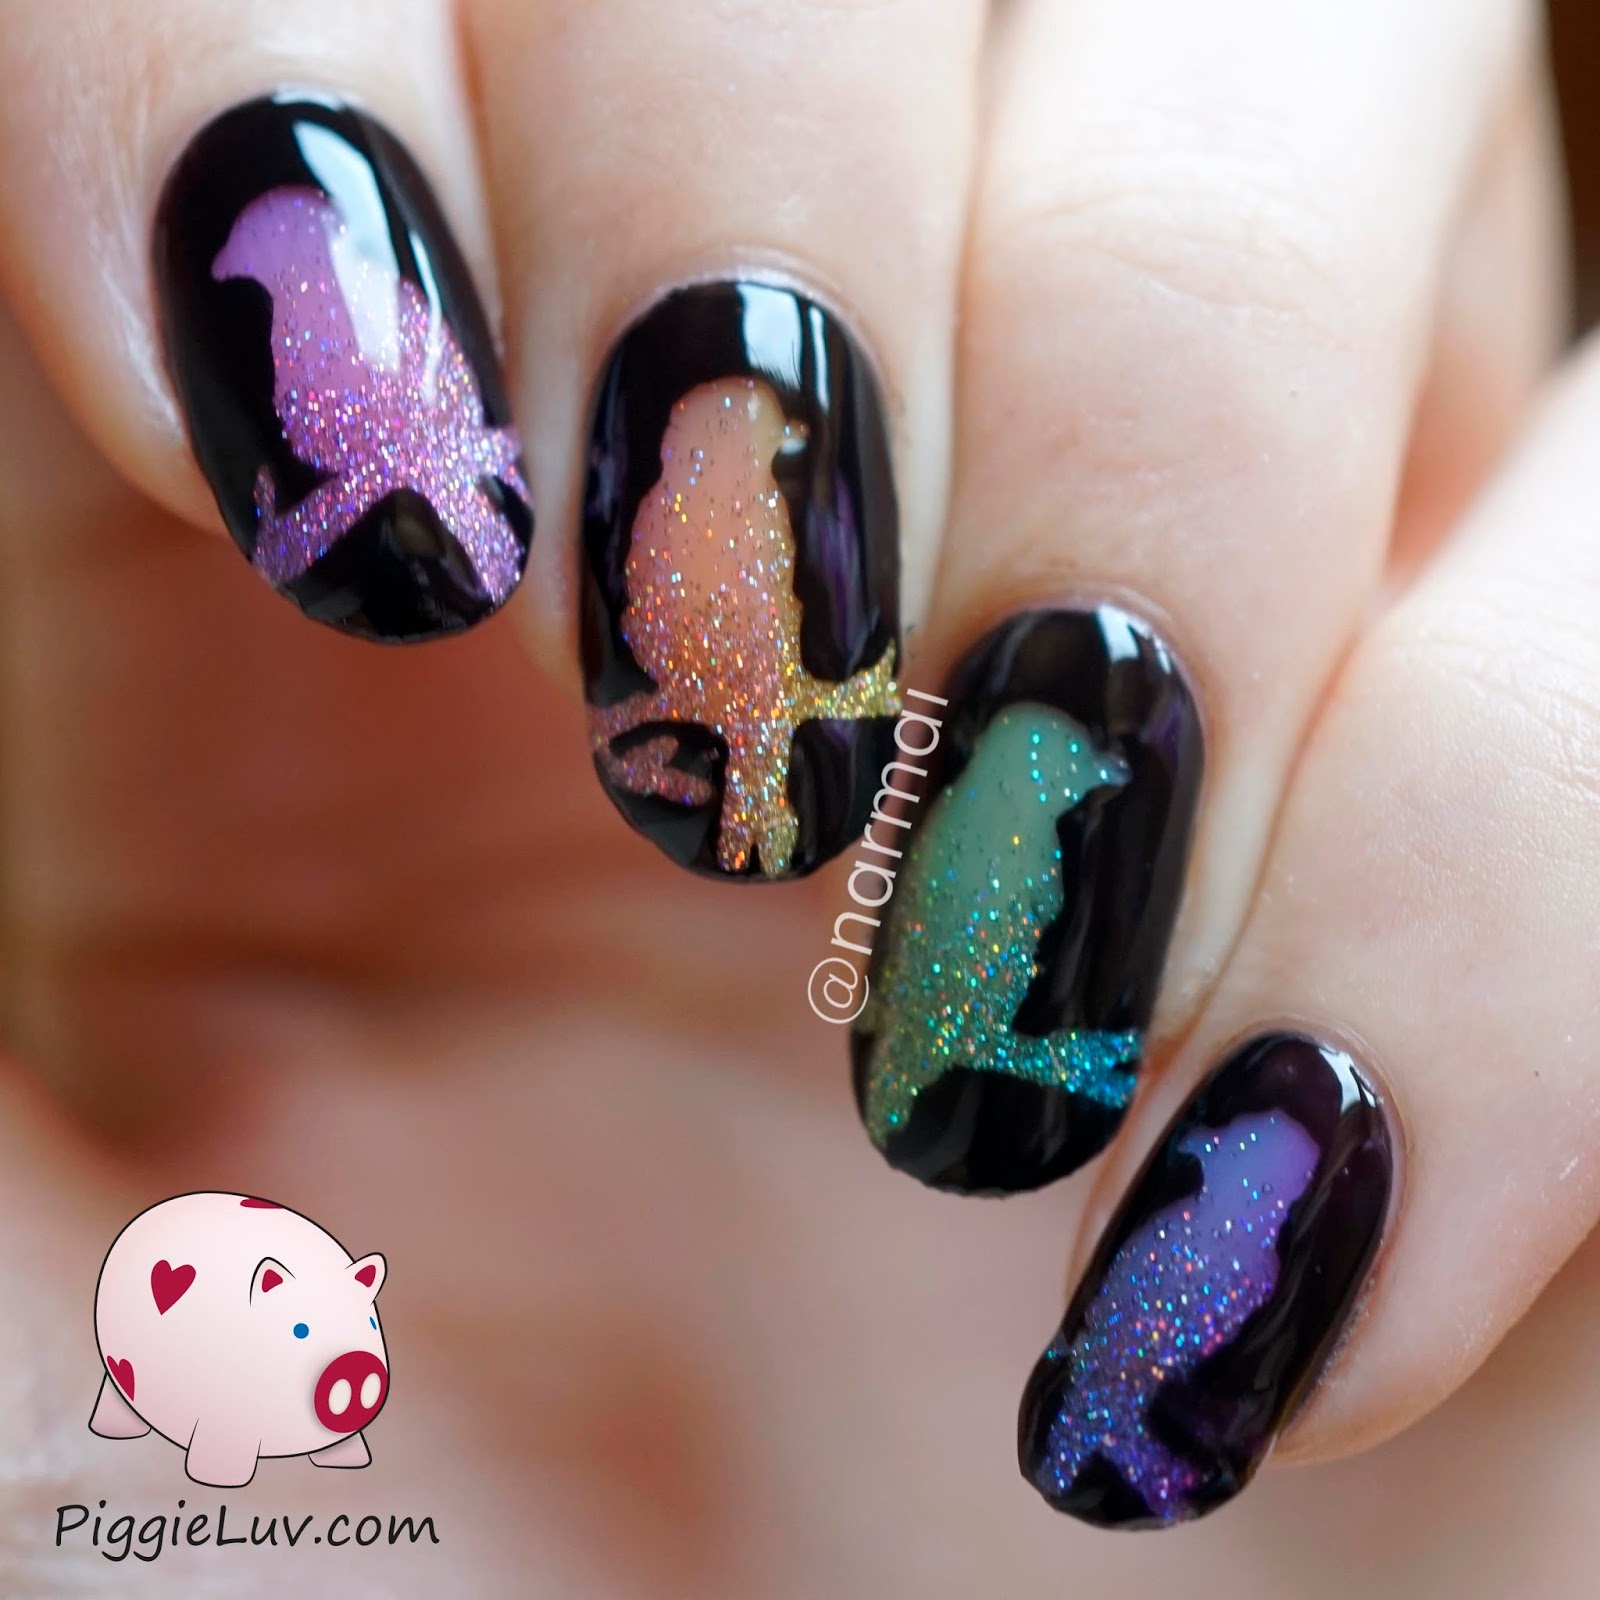 PiggieLuv: Glitter rainbow birds nail art